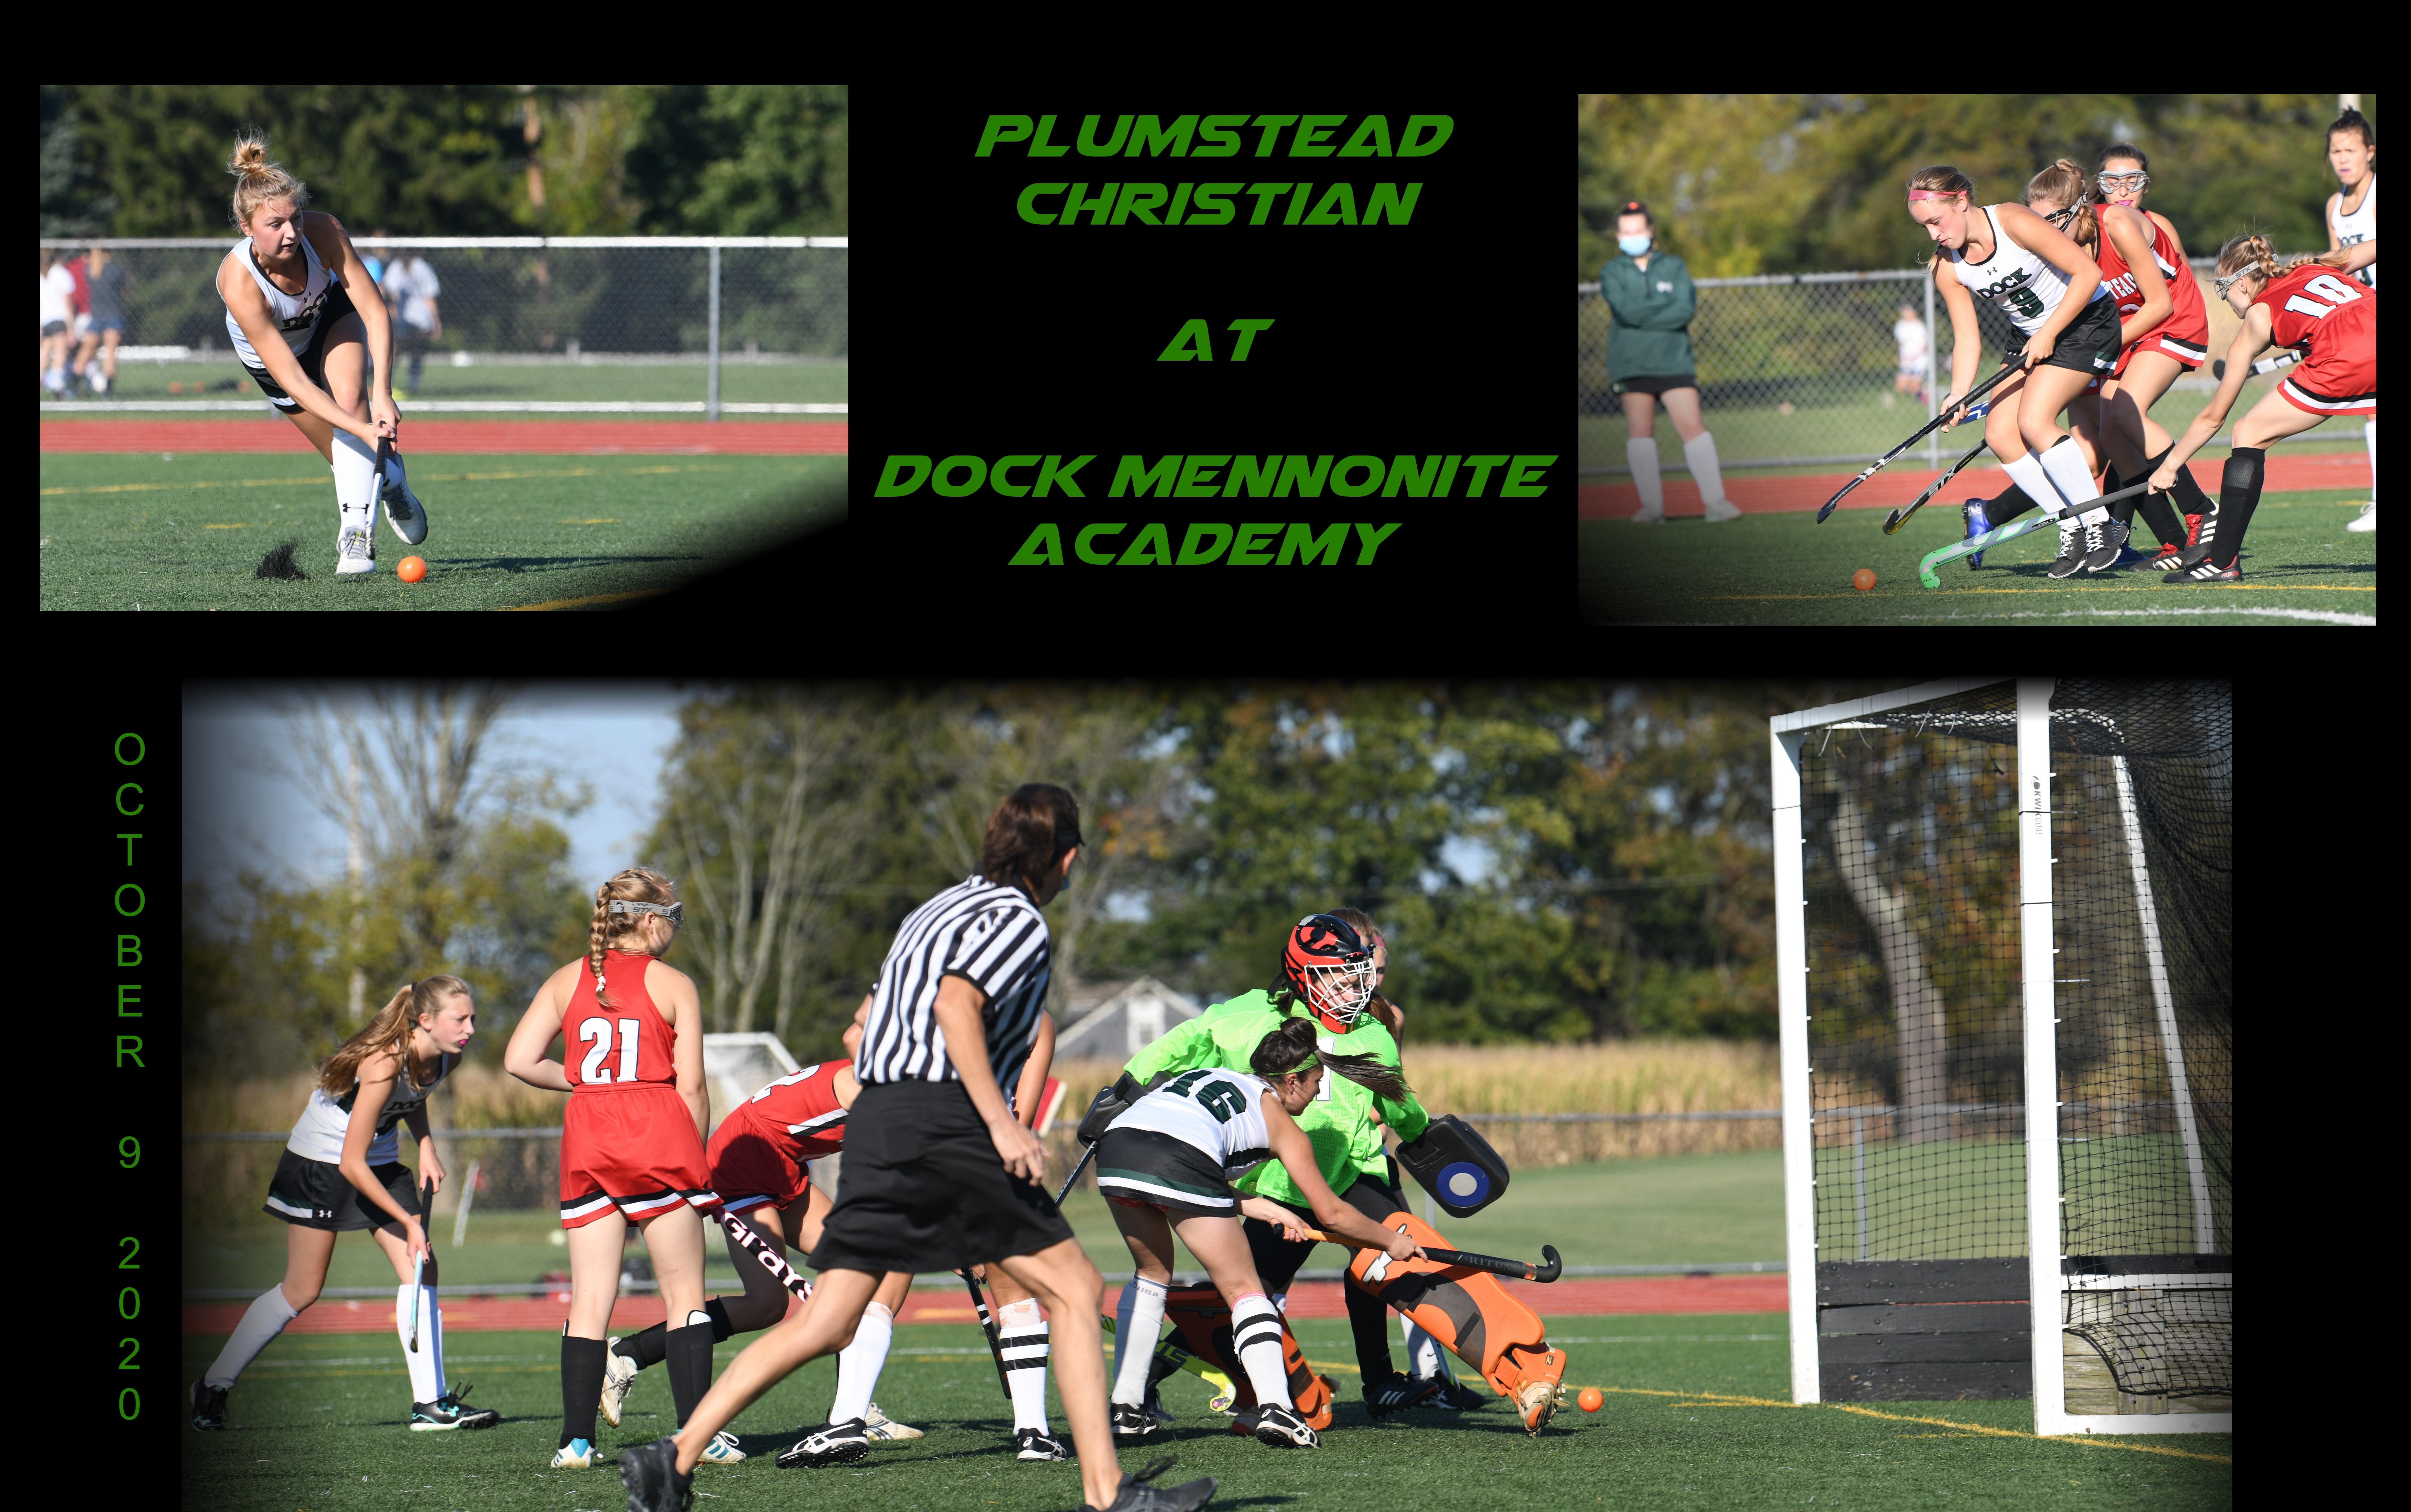 Dock vs Plumstead Christian – October 9, 2020